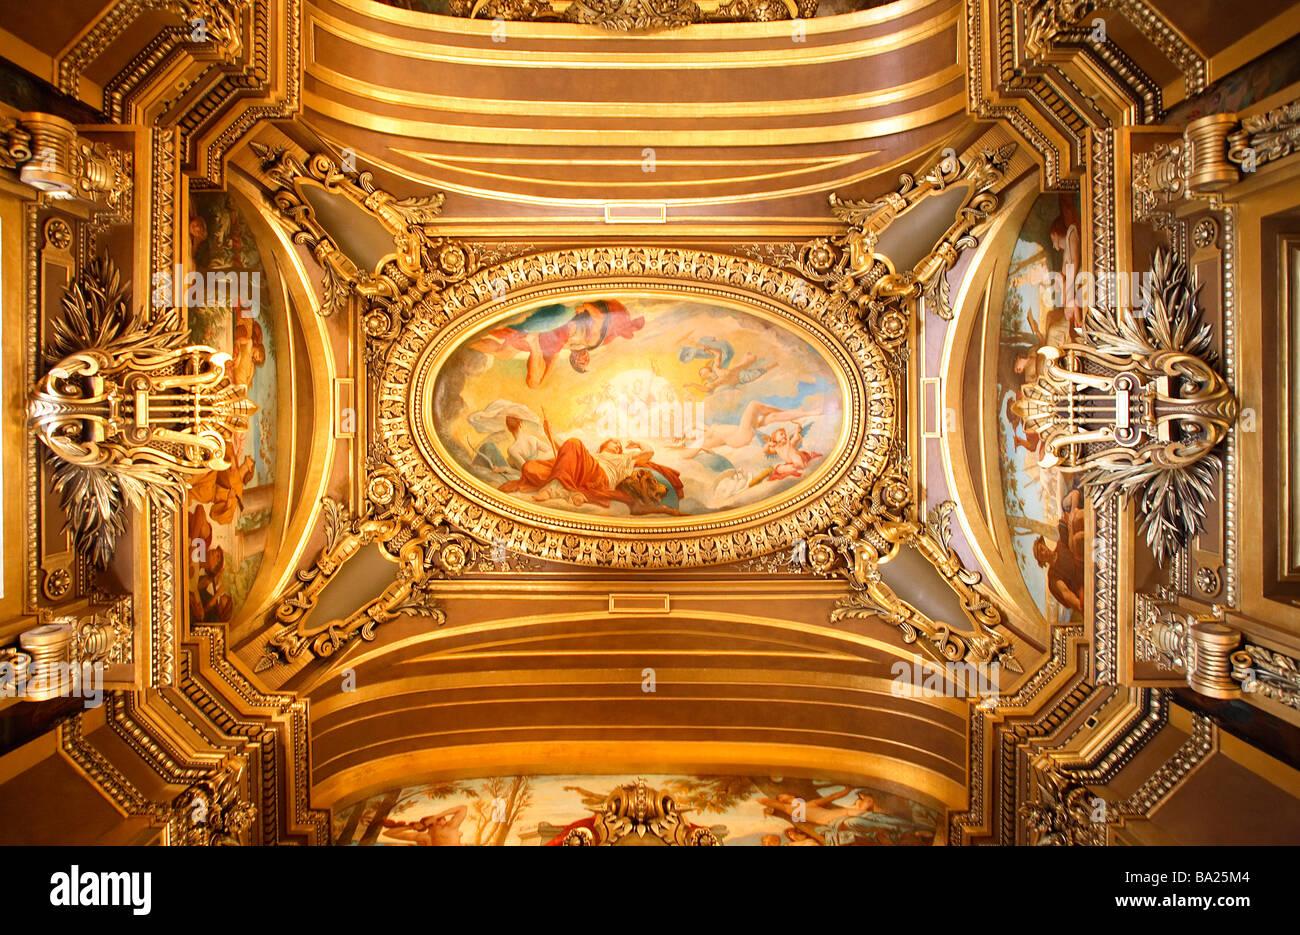 Grand Foyer Opéra Garnier : Grand foyer opera garnier paris stock photo royalty free